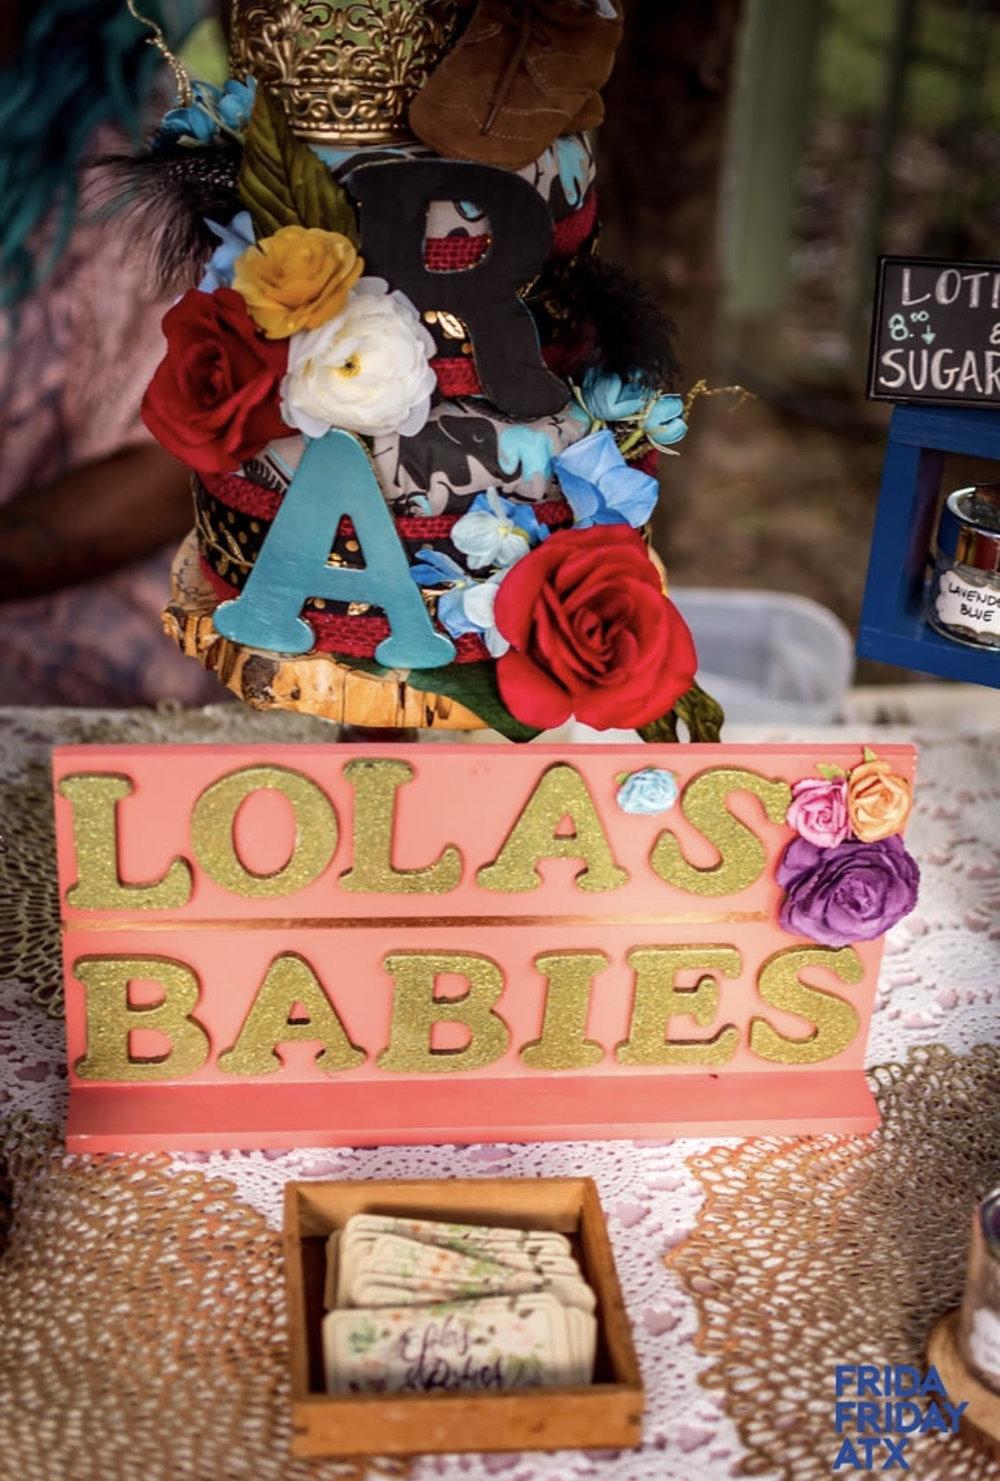 Lola's Babies